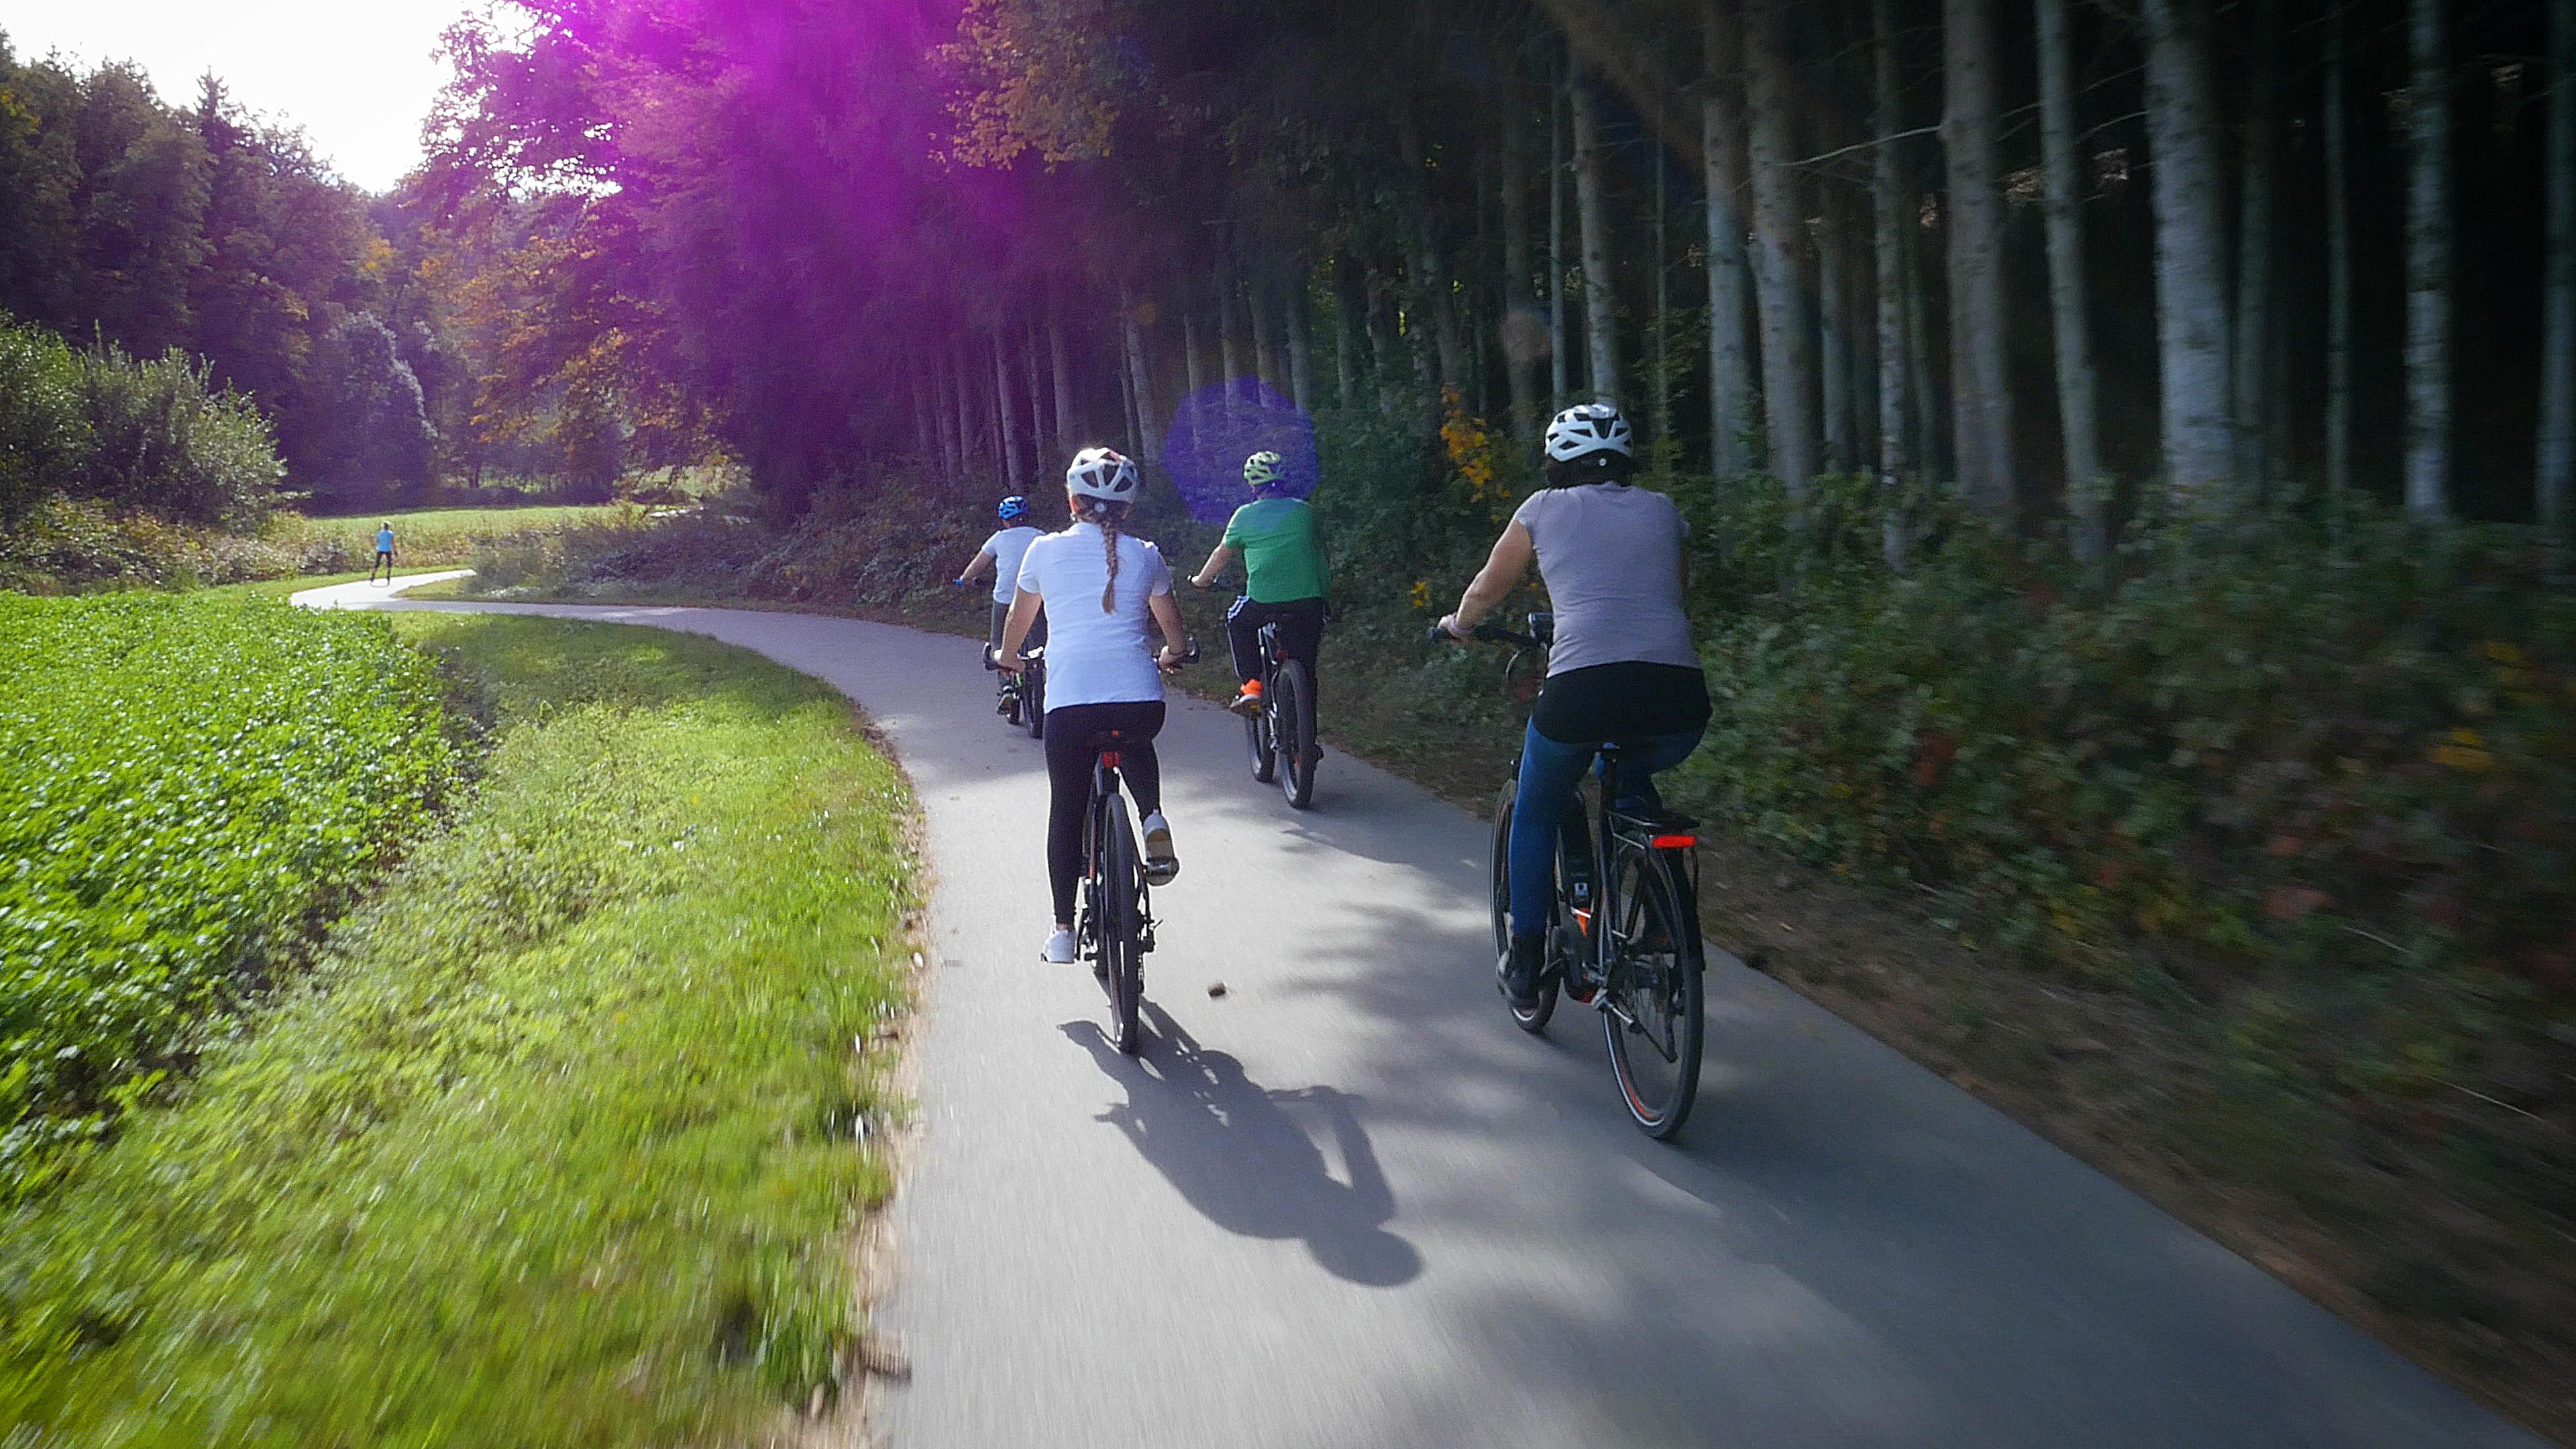 Wolfachradweg